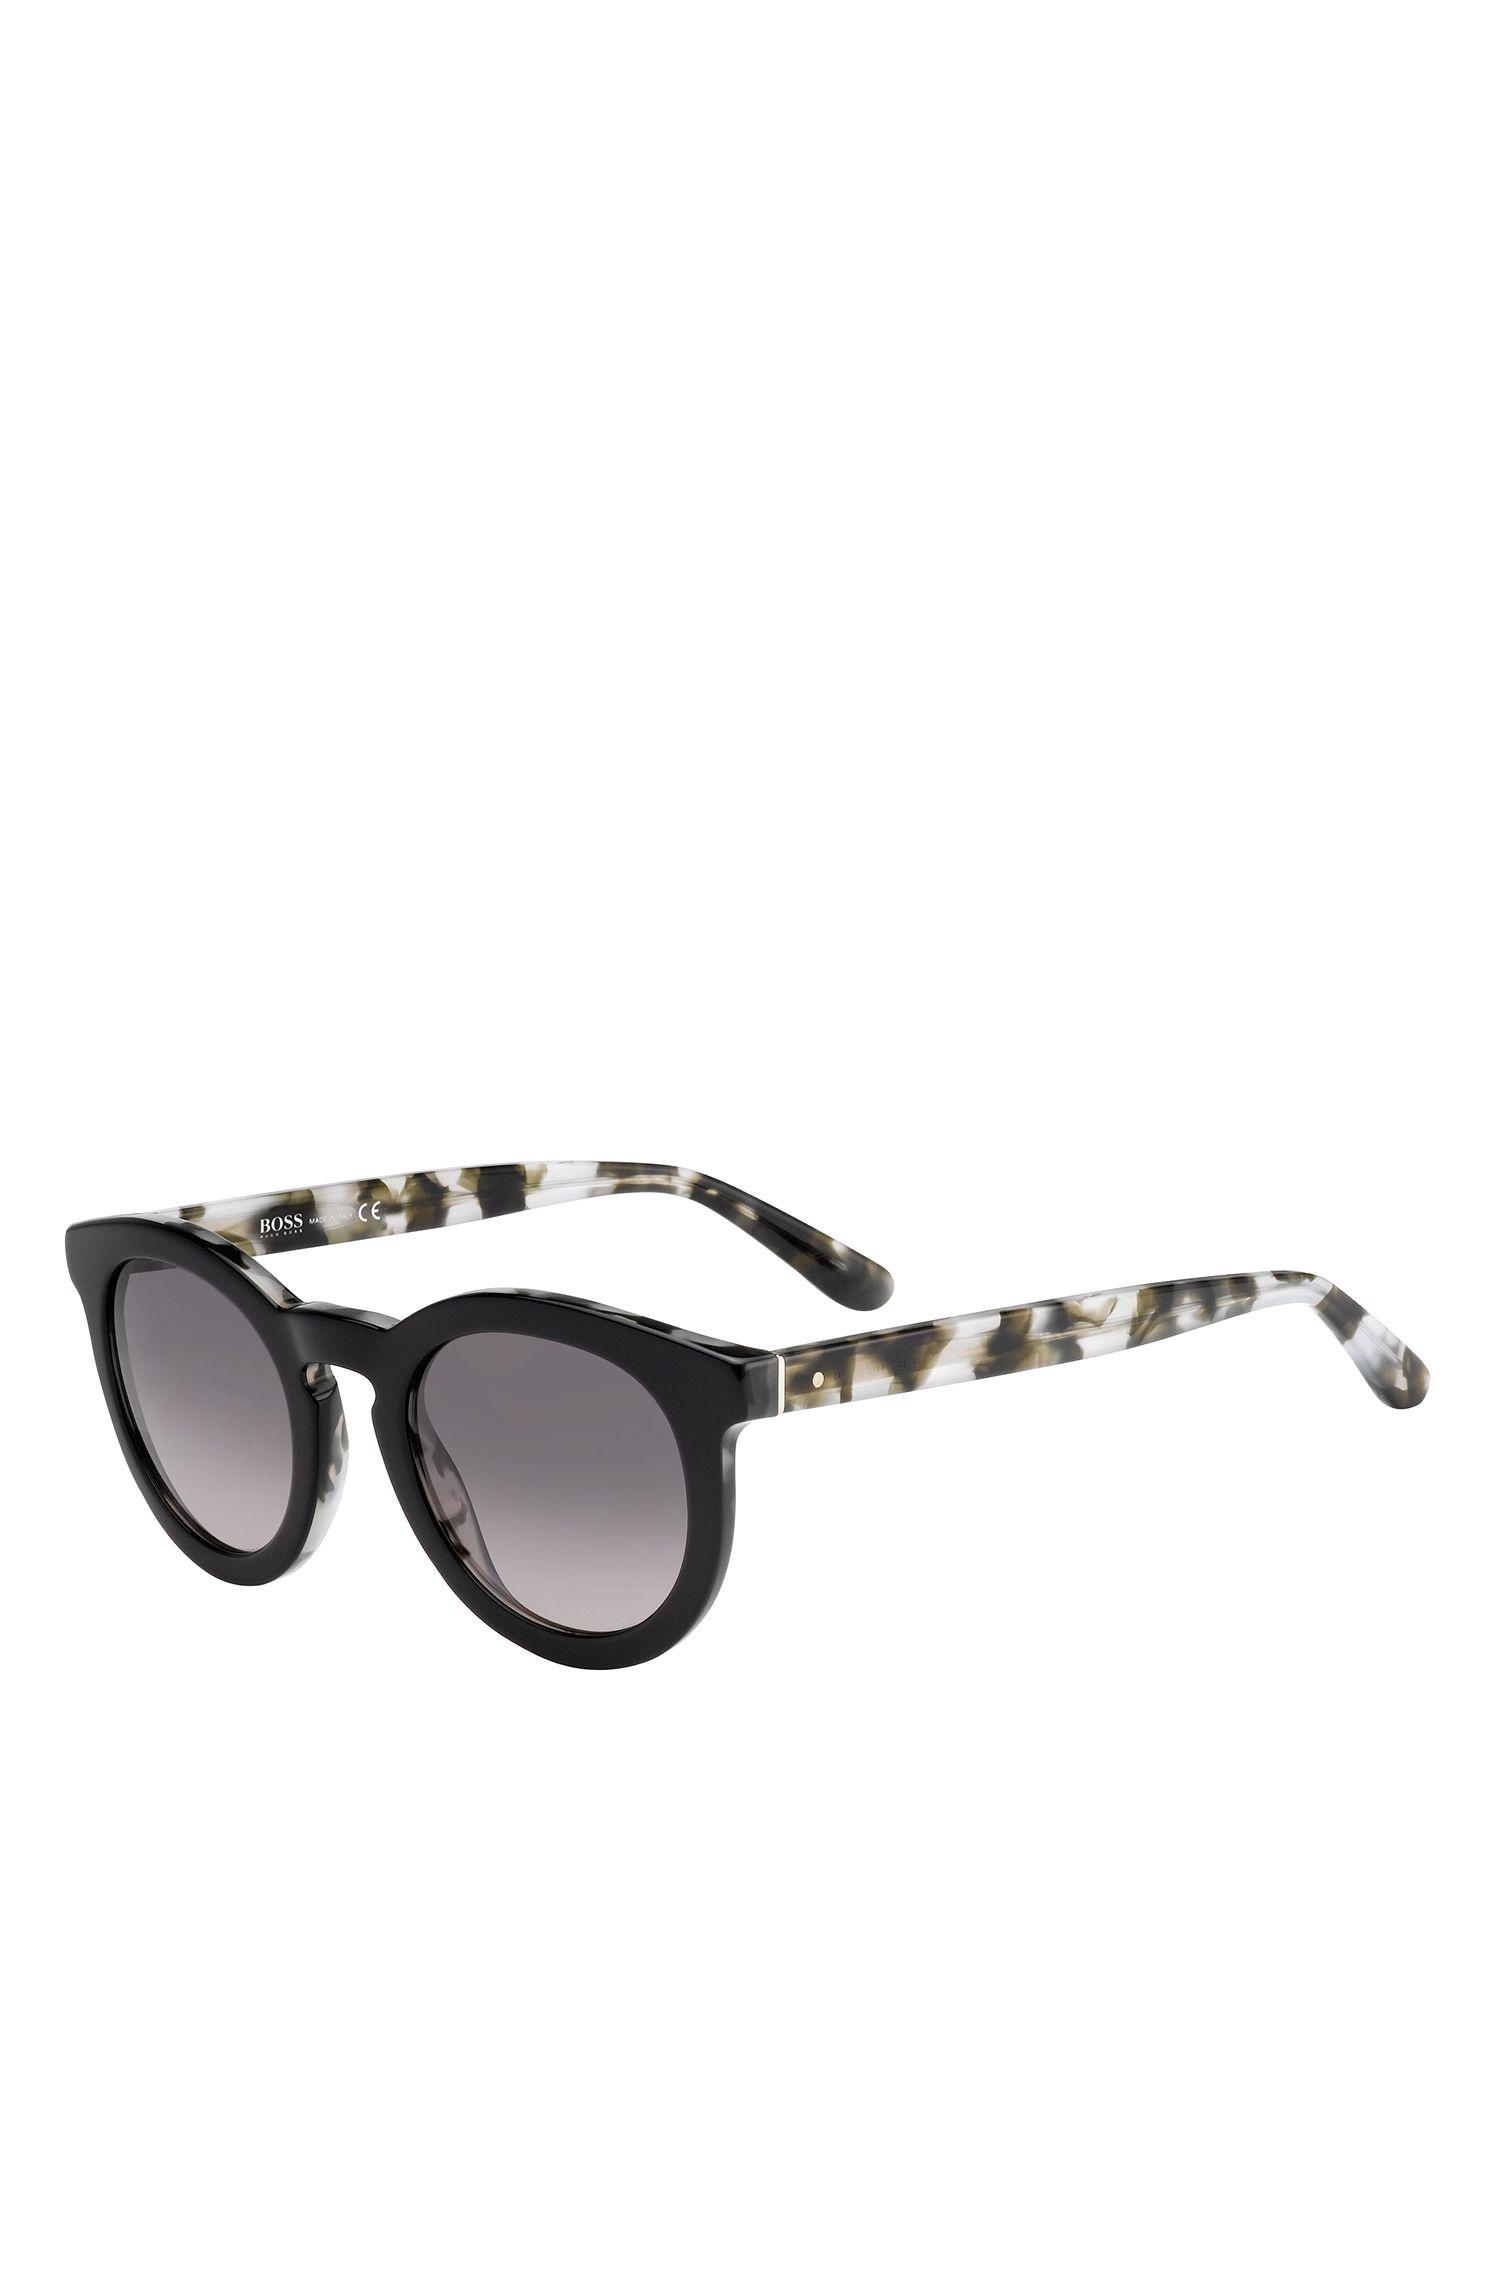 'BOSS 0742S' | Gradient Lenses Roud Cateye Sunglasses